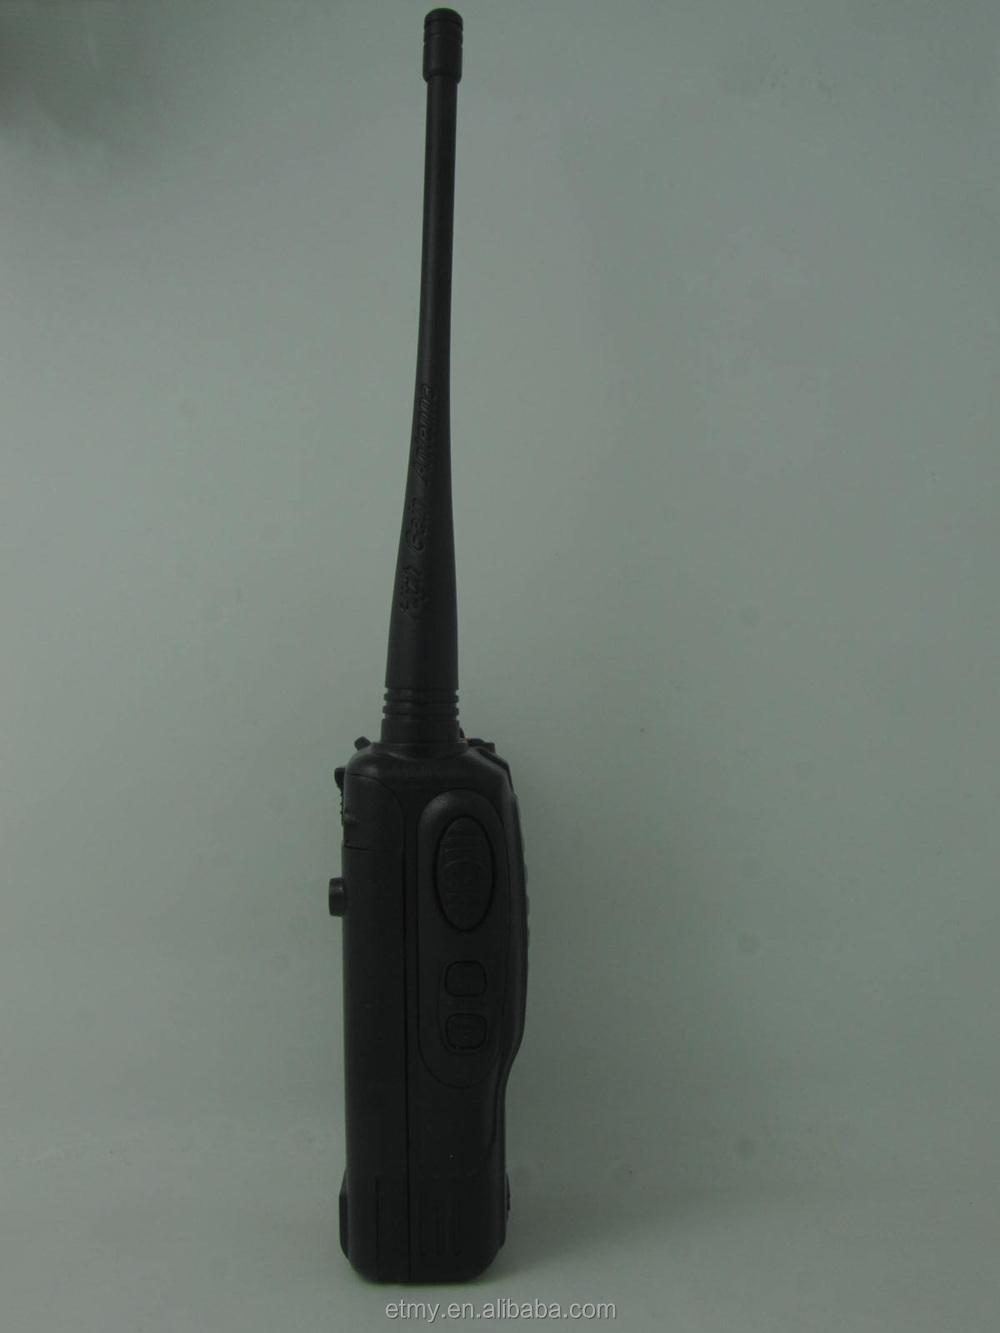 Own Brand Wholesale Long Range Walkie Talkie Ip66 Ecome Et-558 ...